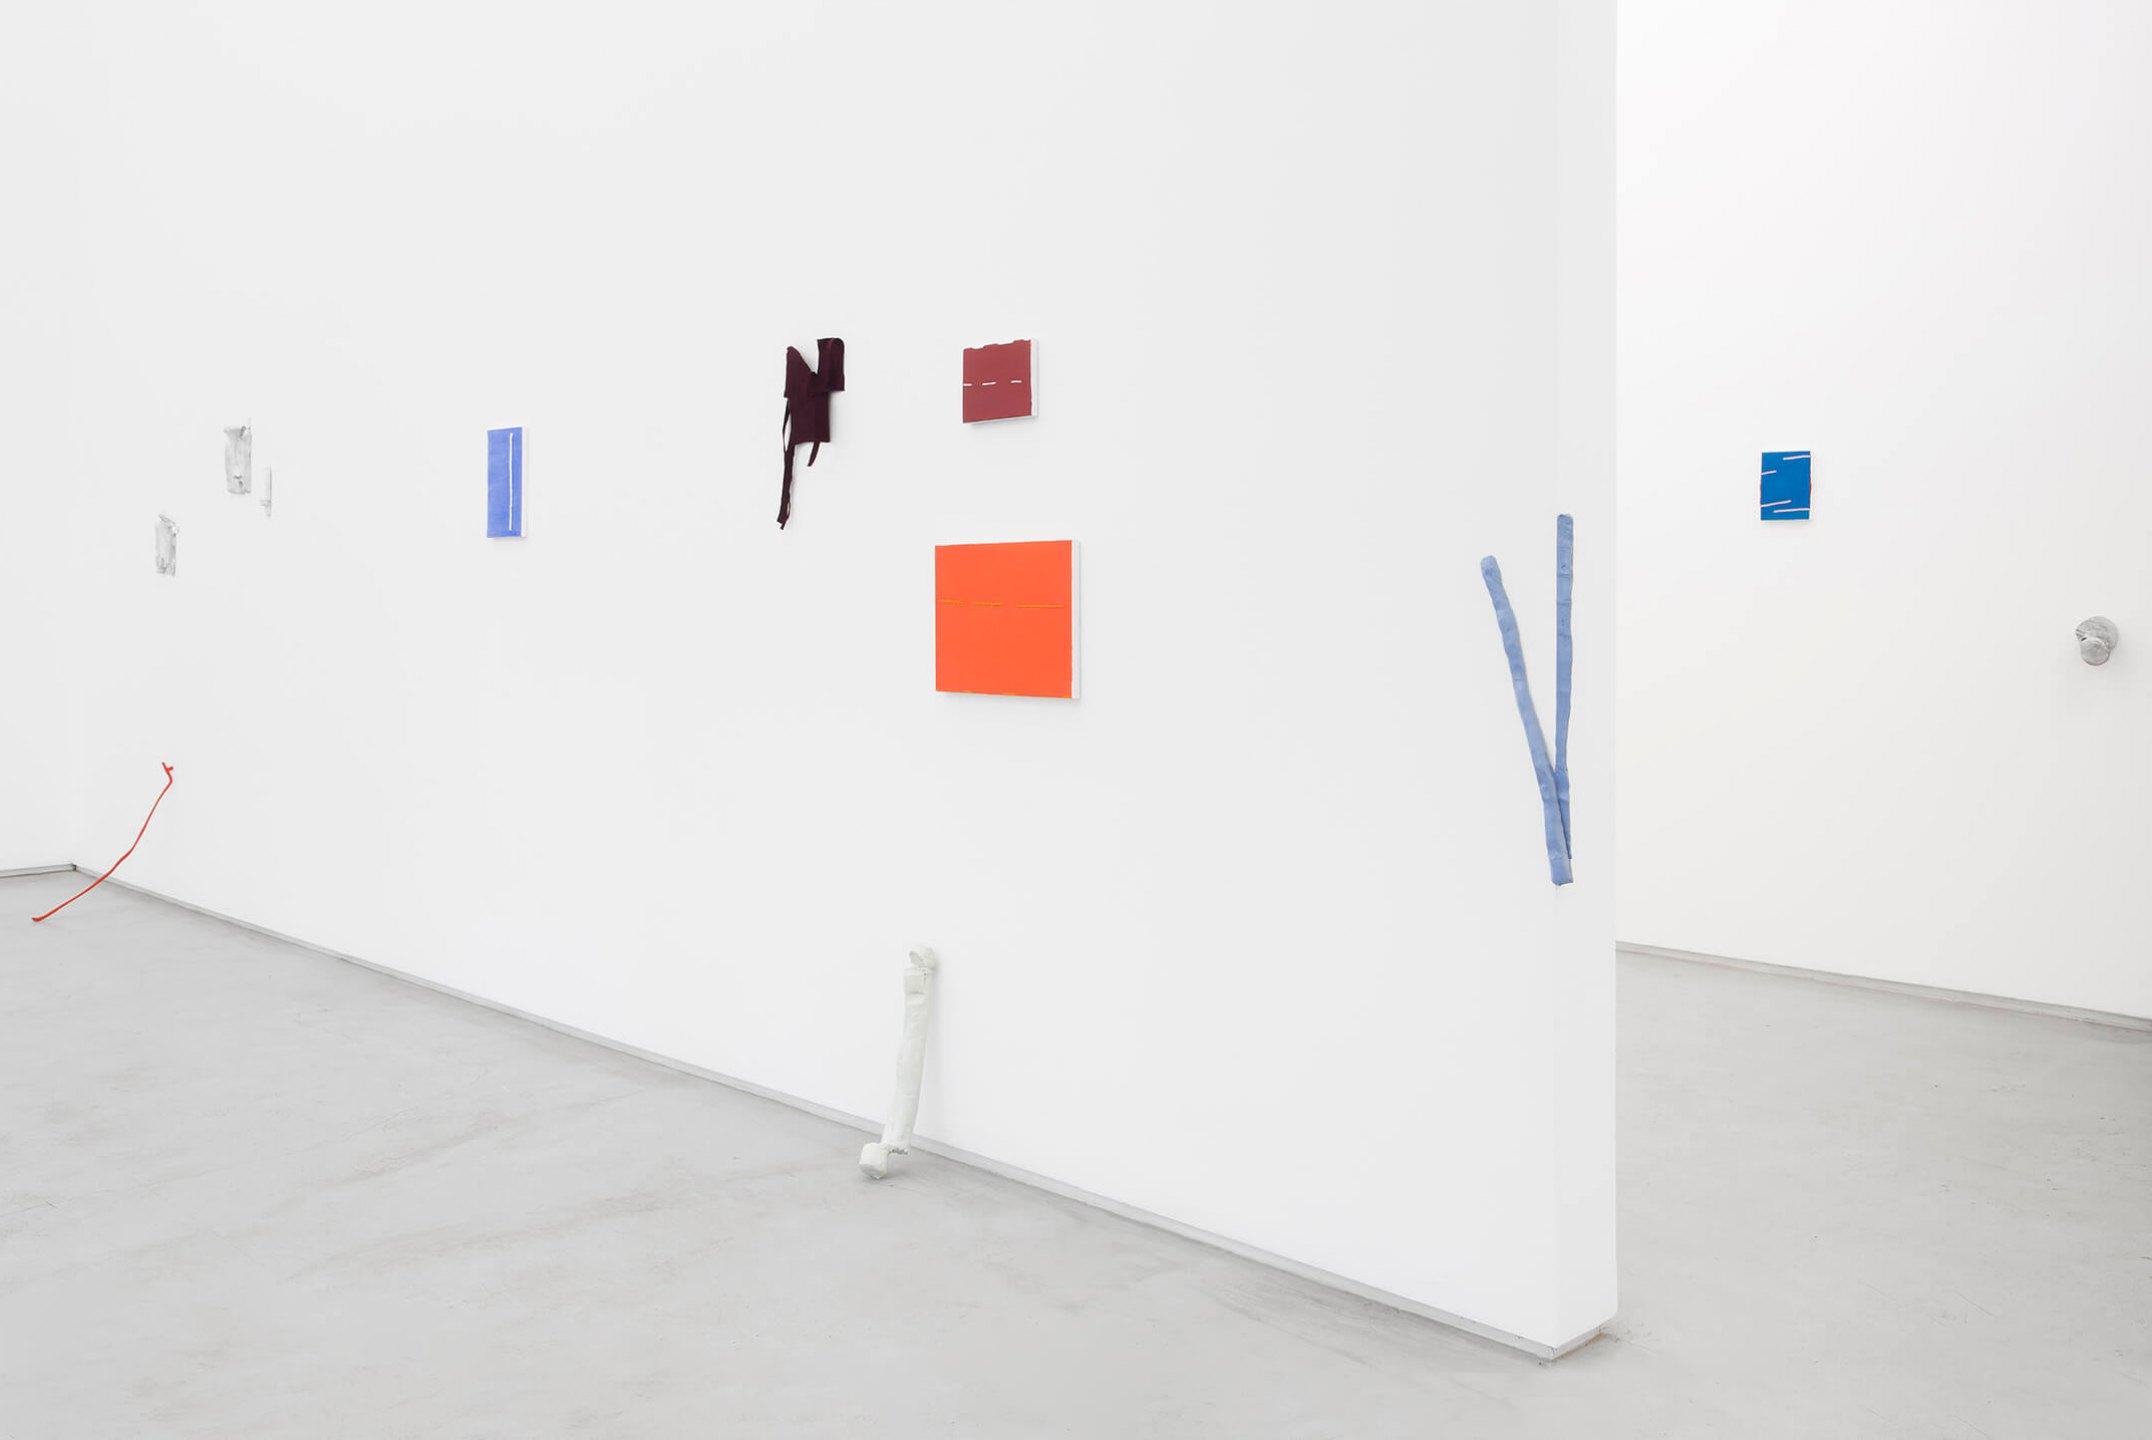 Paulo Monteiro,&nbsp;<em>The inside of distance</em>,&nbsp;Mendes Wood DM, São Paulo, 2015 - Mendes Wood DM